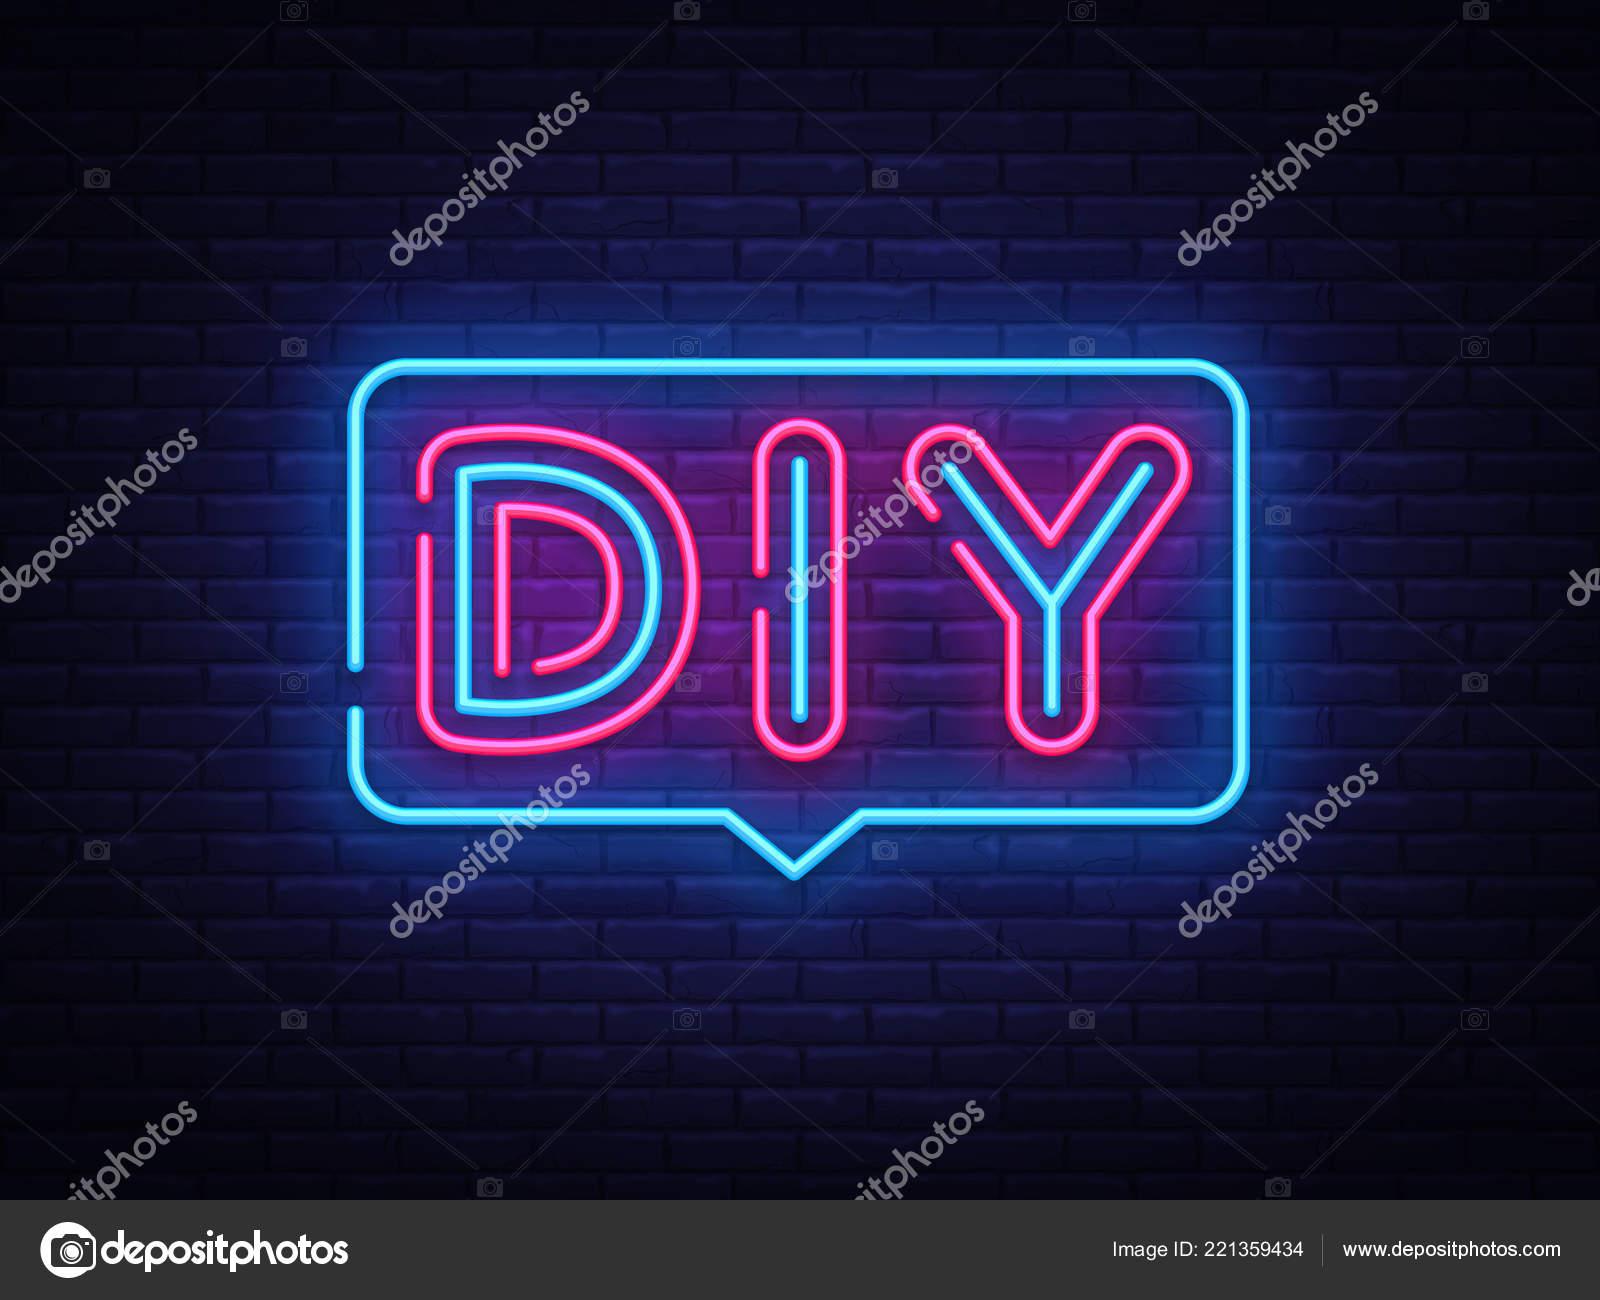 Diy Briefe Neon Text Vektor Do It Yourself Leuchtreklame Design